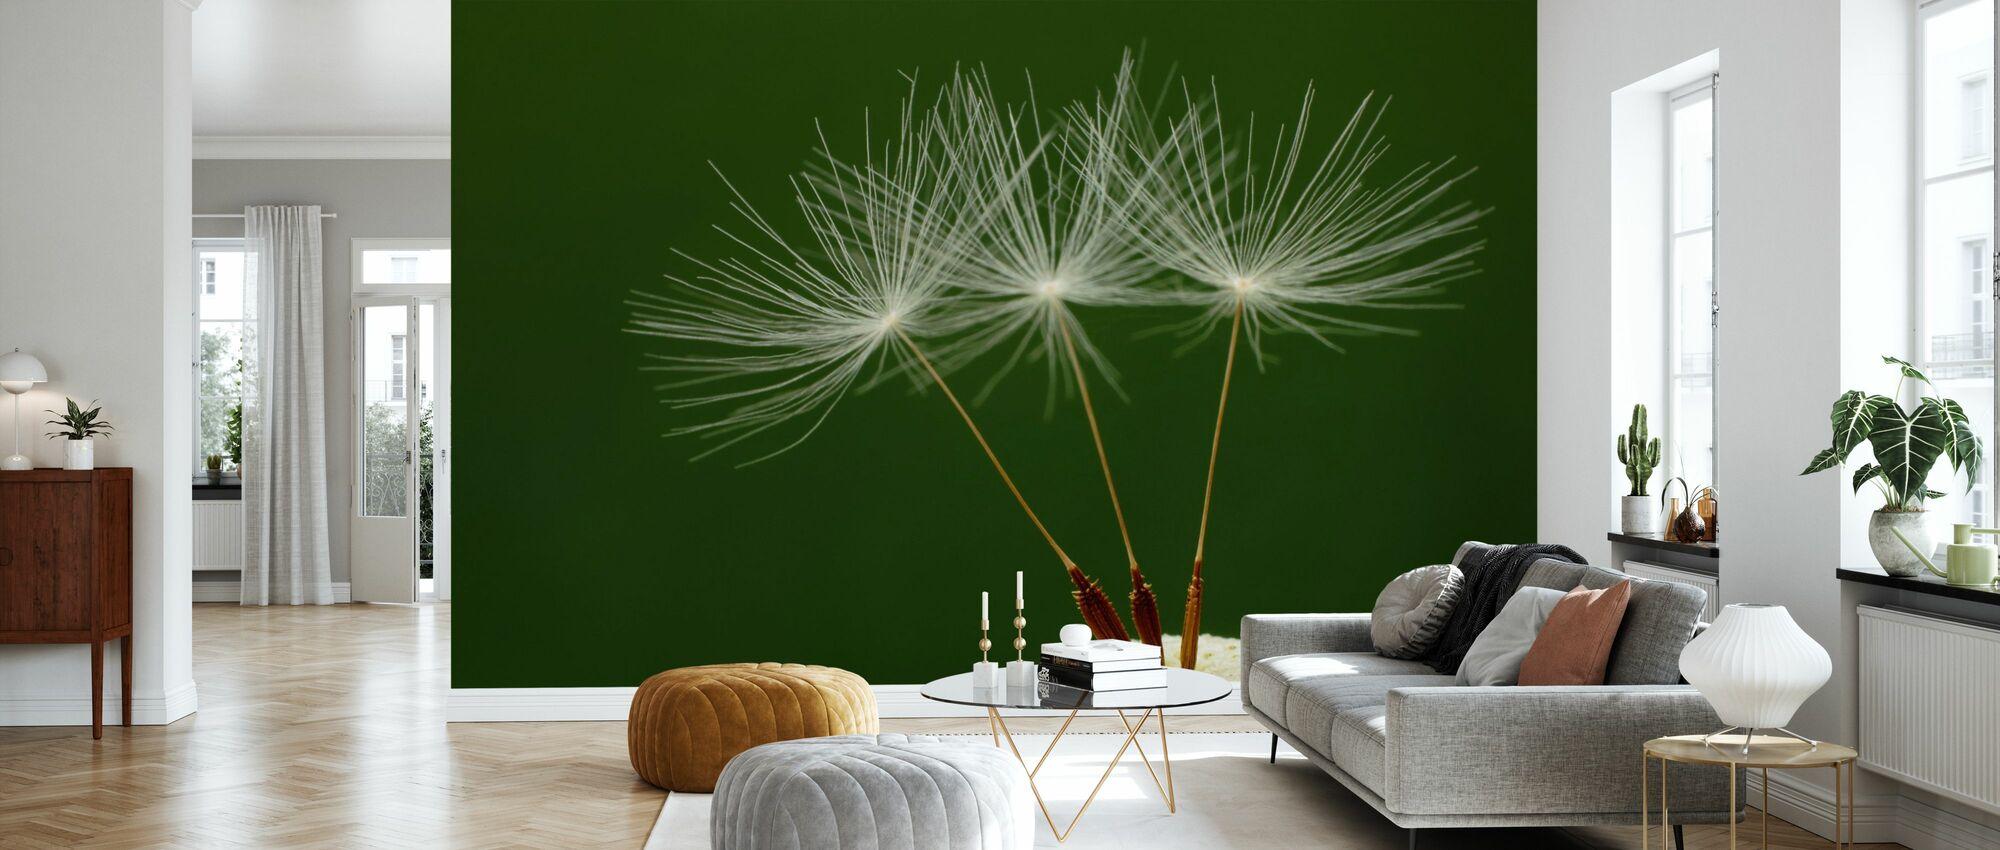 Three Dandelion Seeds - Wallpaper - Living Room